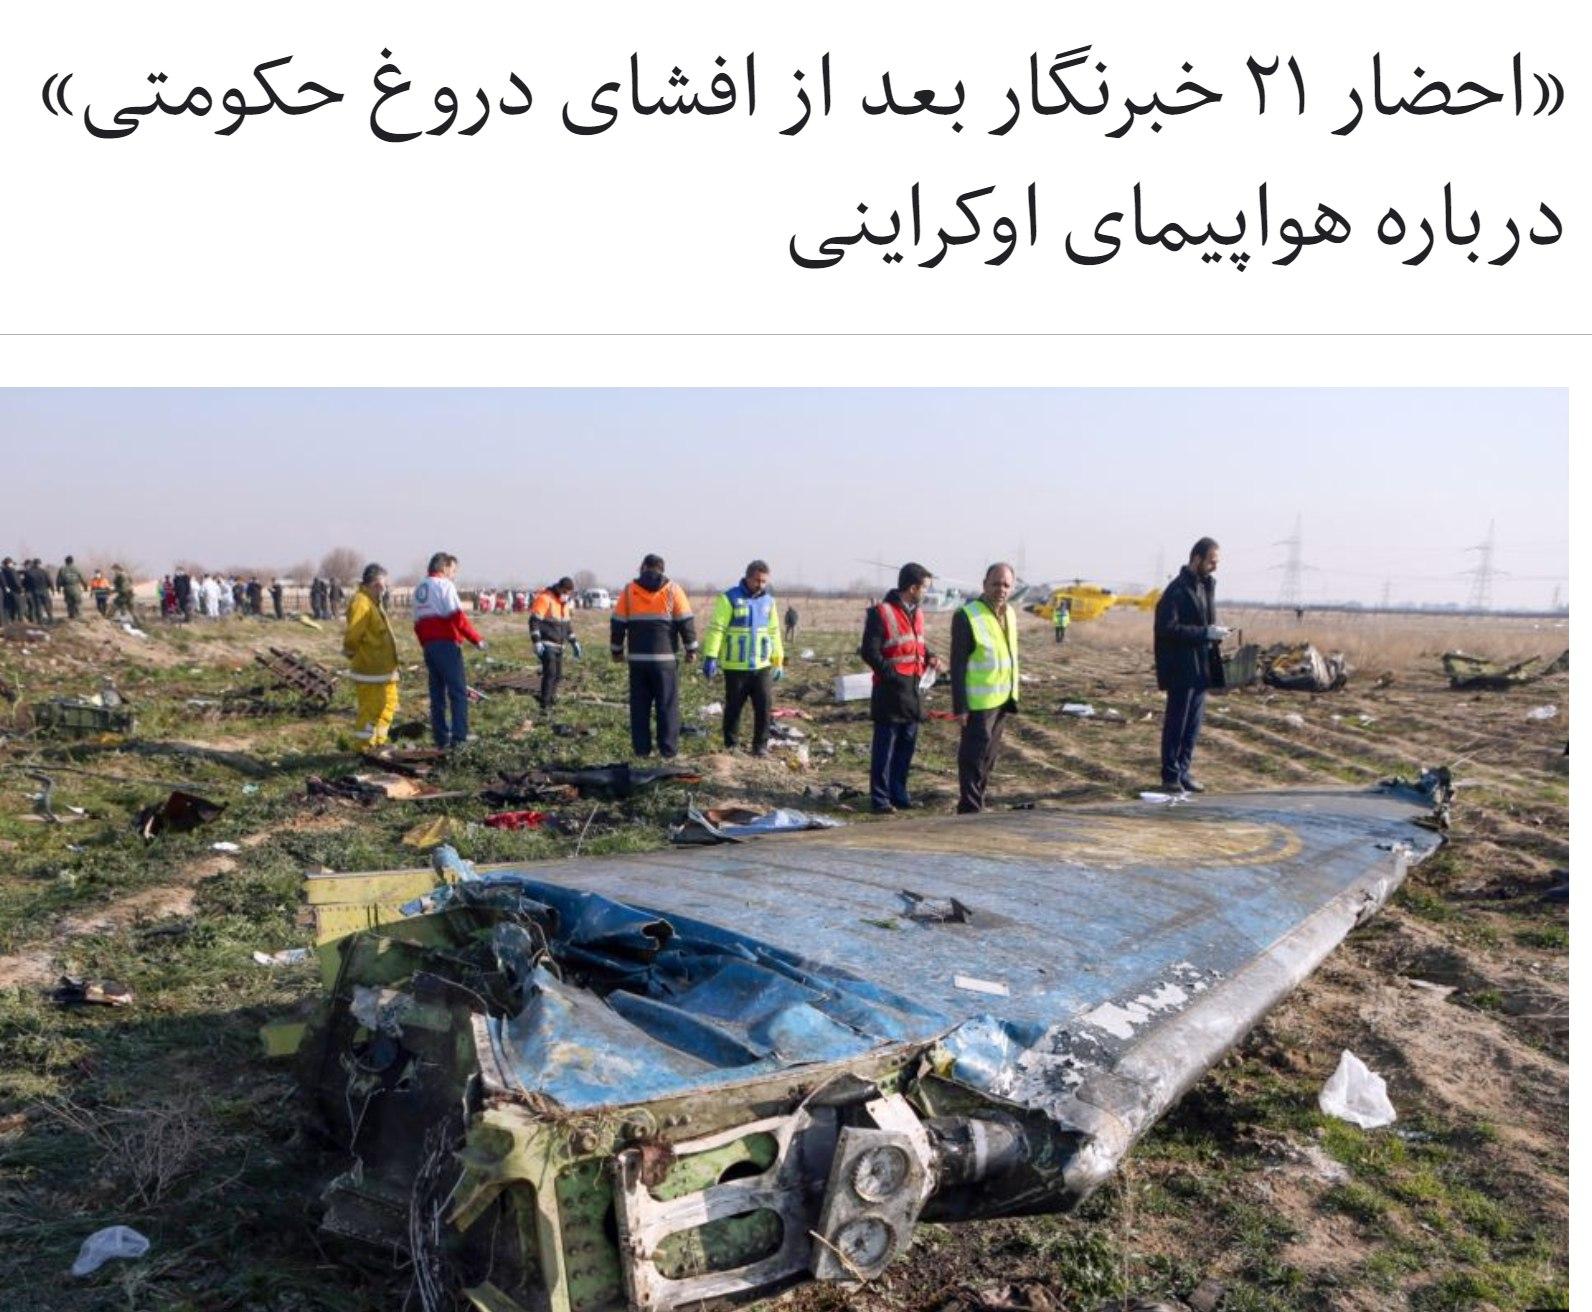 گزارشگران بدون مرز پنجشنبه ۱ … 916083001581018005